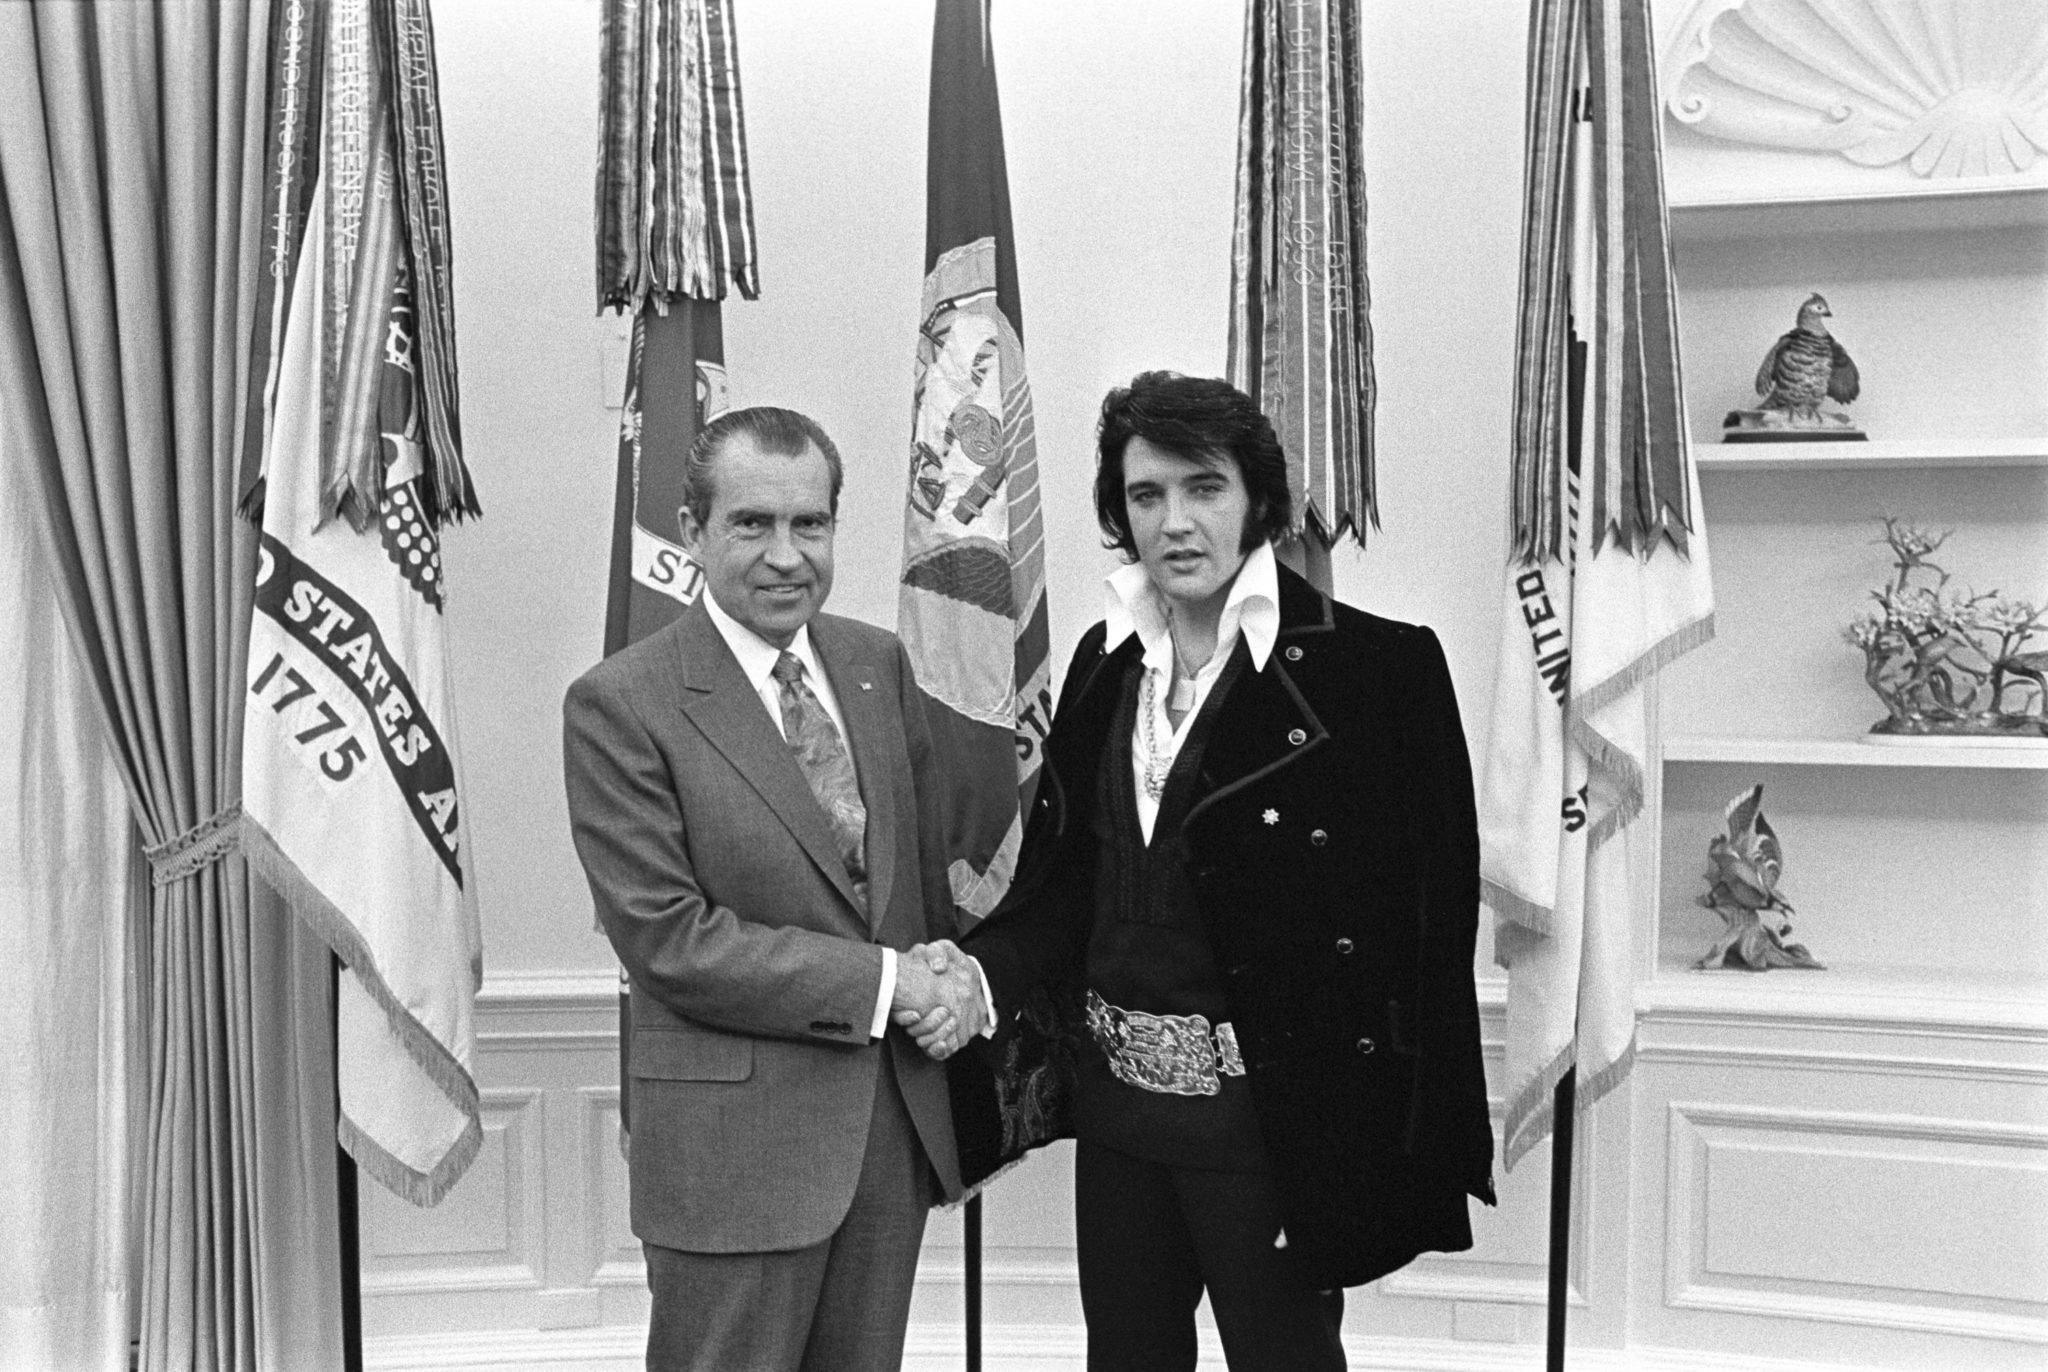 Elvis Met Nixon 50 Years Ago Today in One of the Weirdest White House Meetings in History